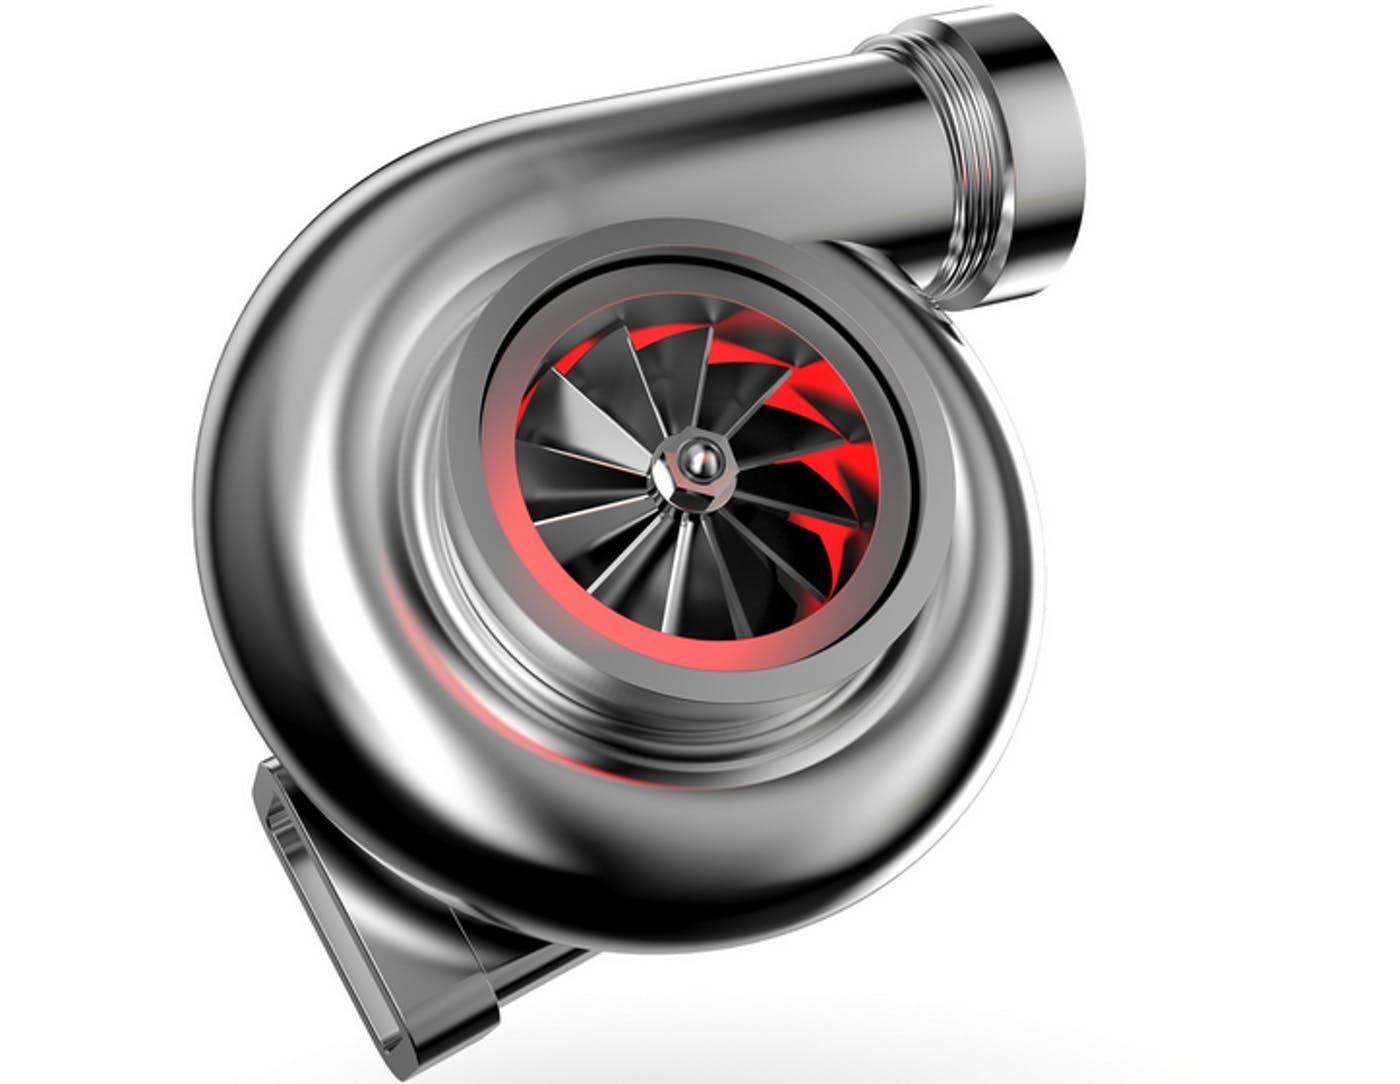 medium resolution of turbo jpeg